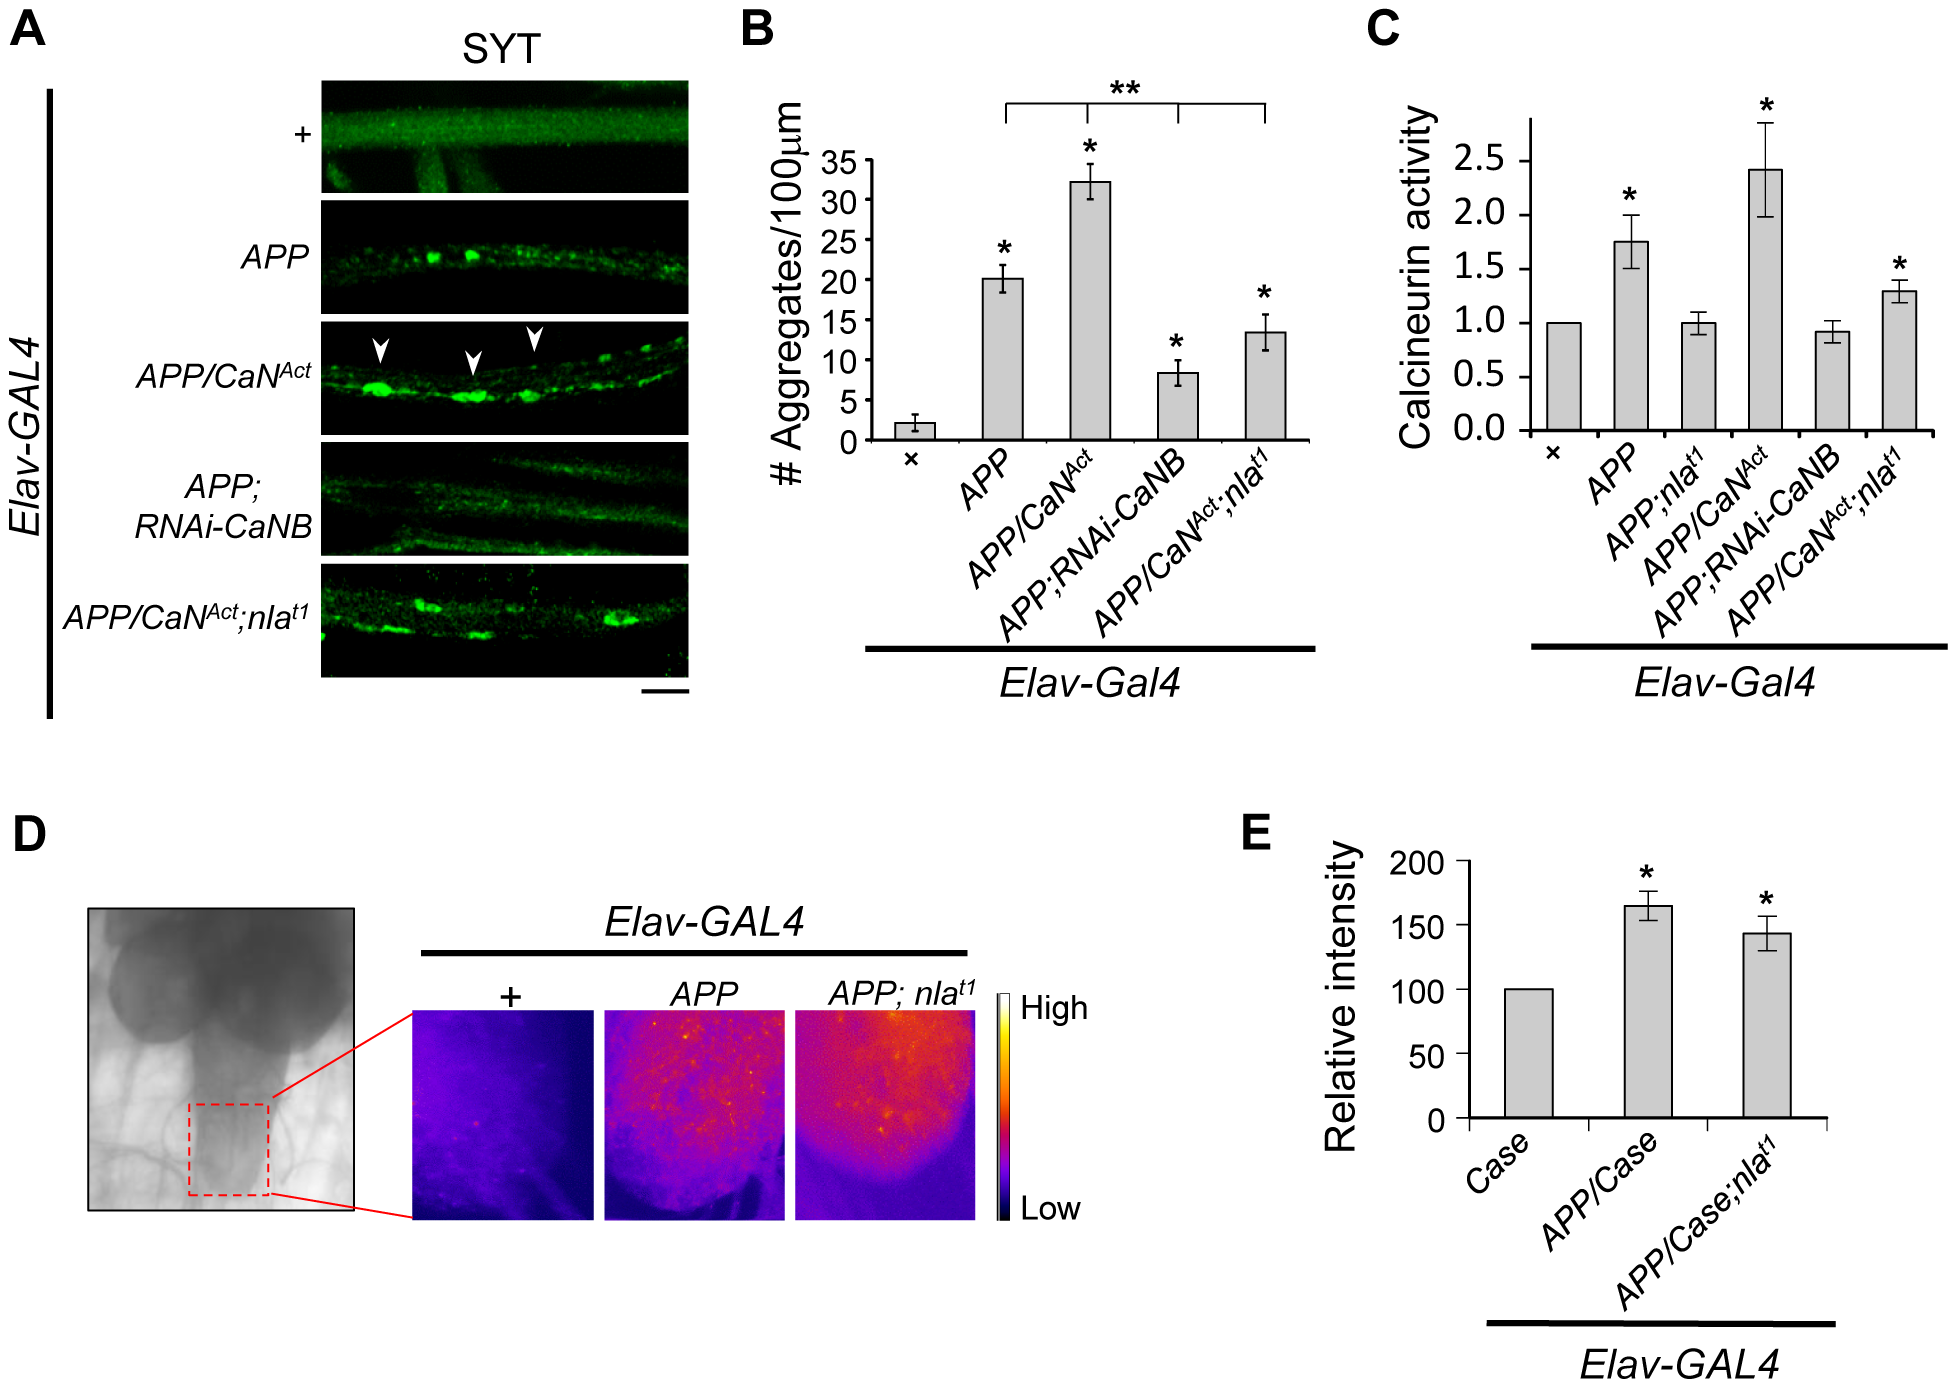 Nebula modulates APP-dependent phenotypes by restoring calcineurin signaling.